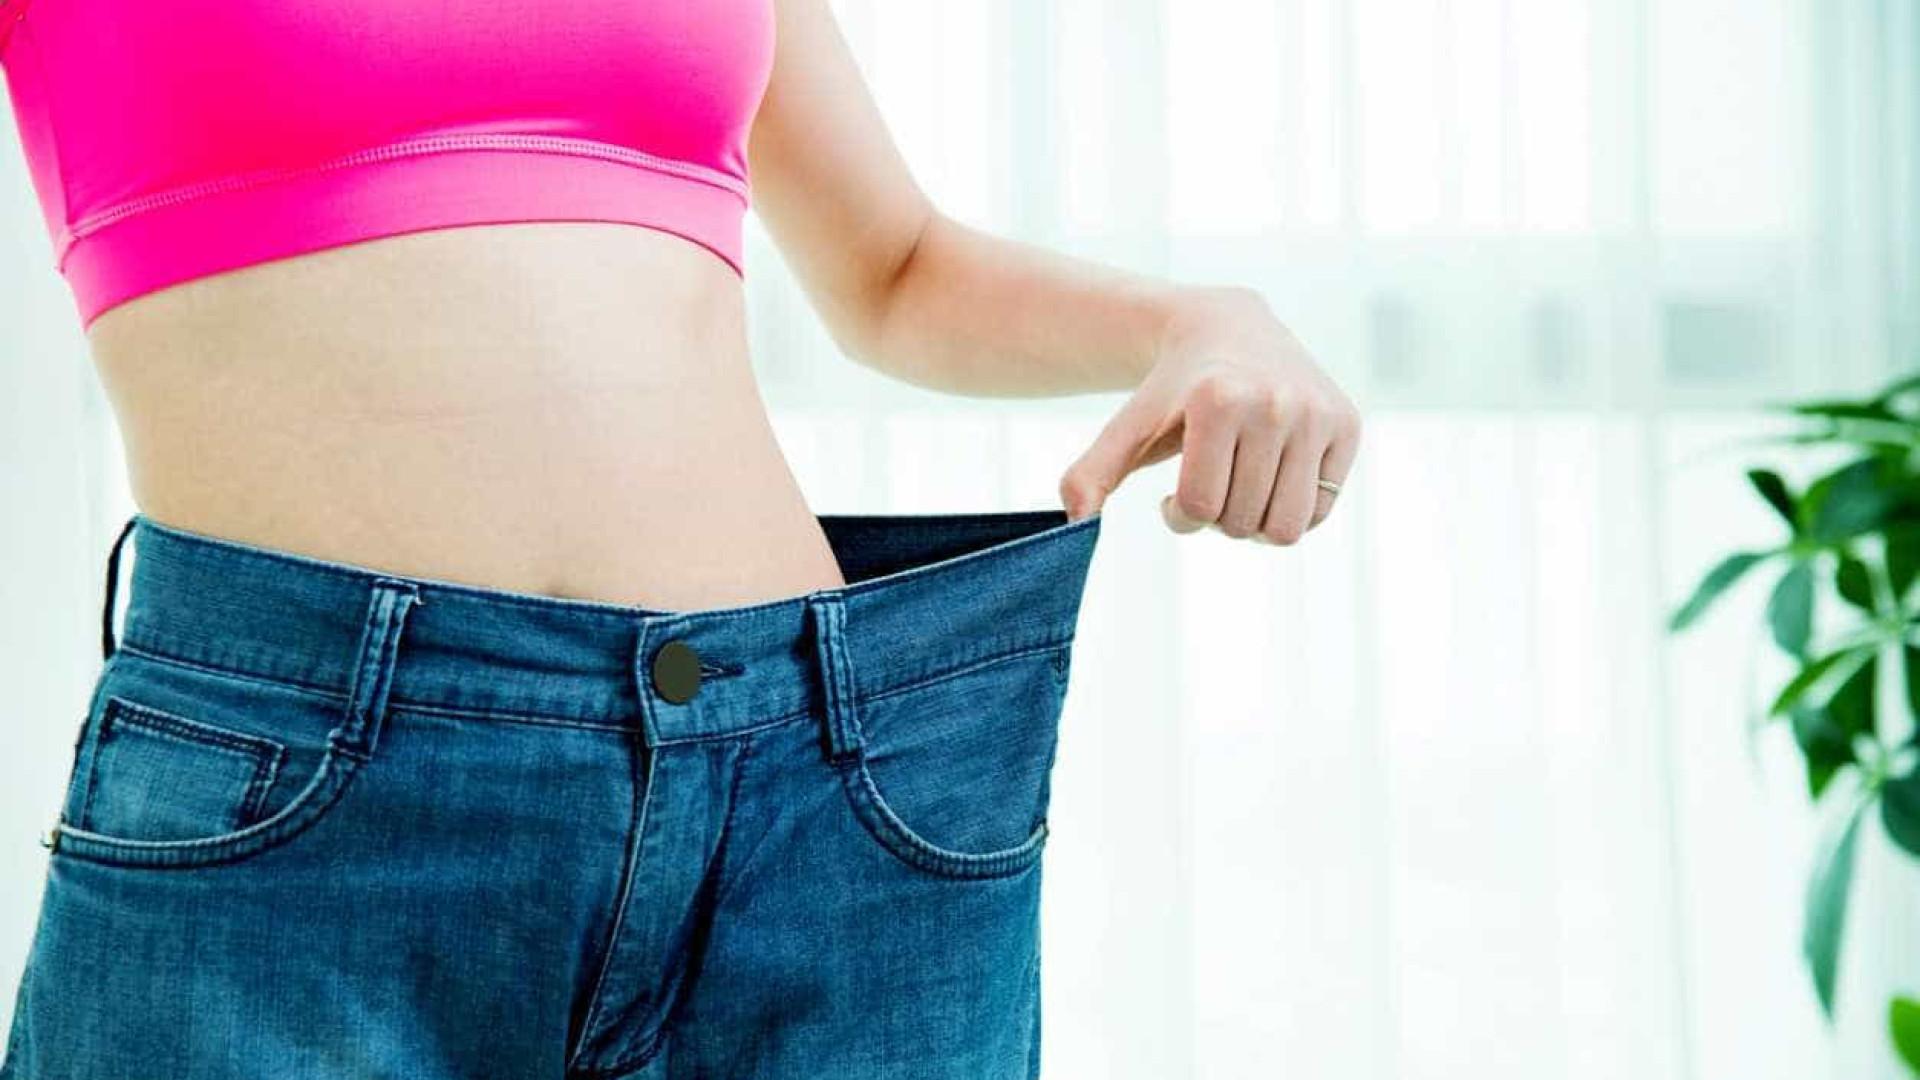 Stress perdida de peso repentina